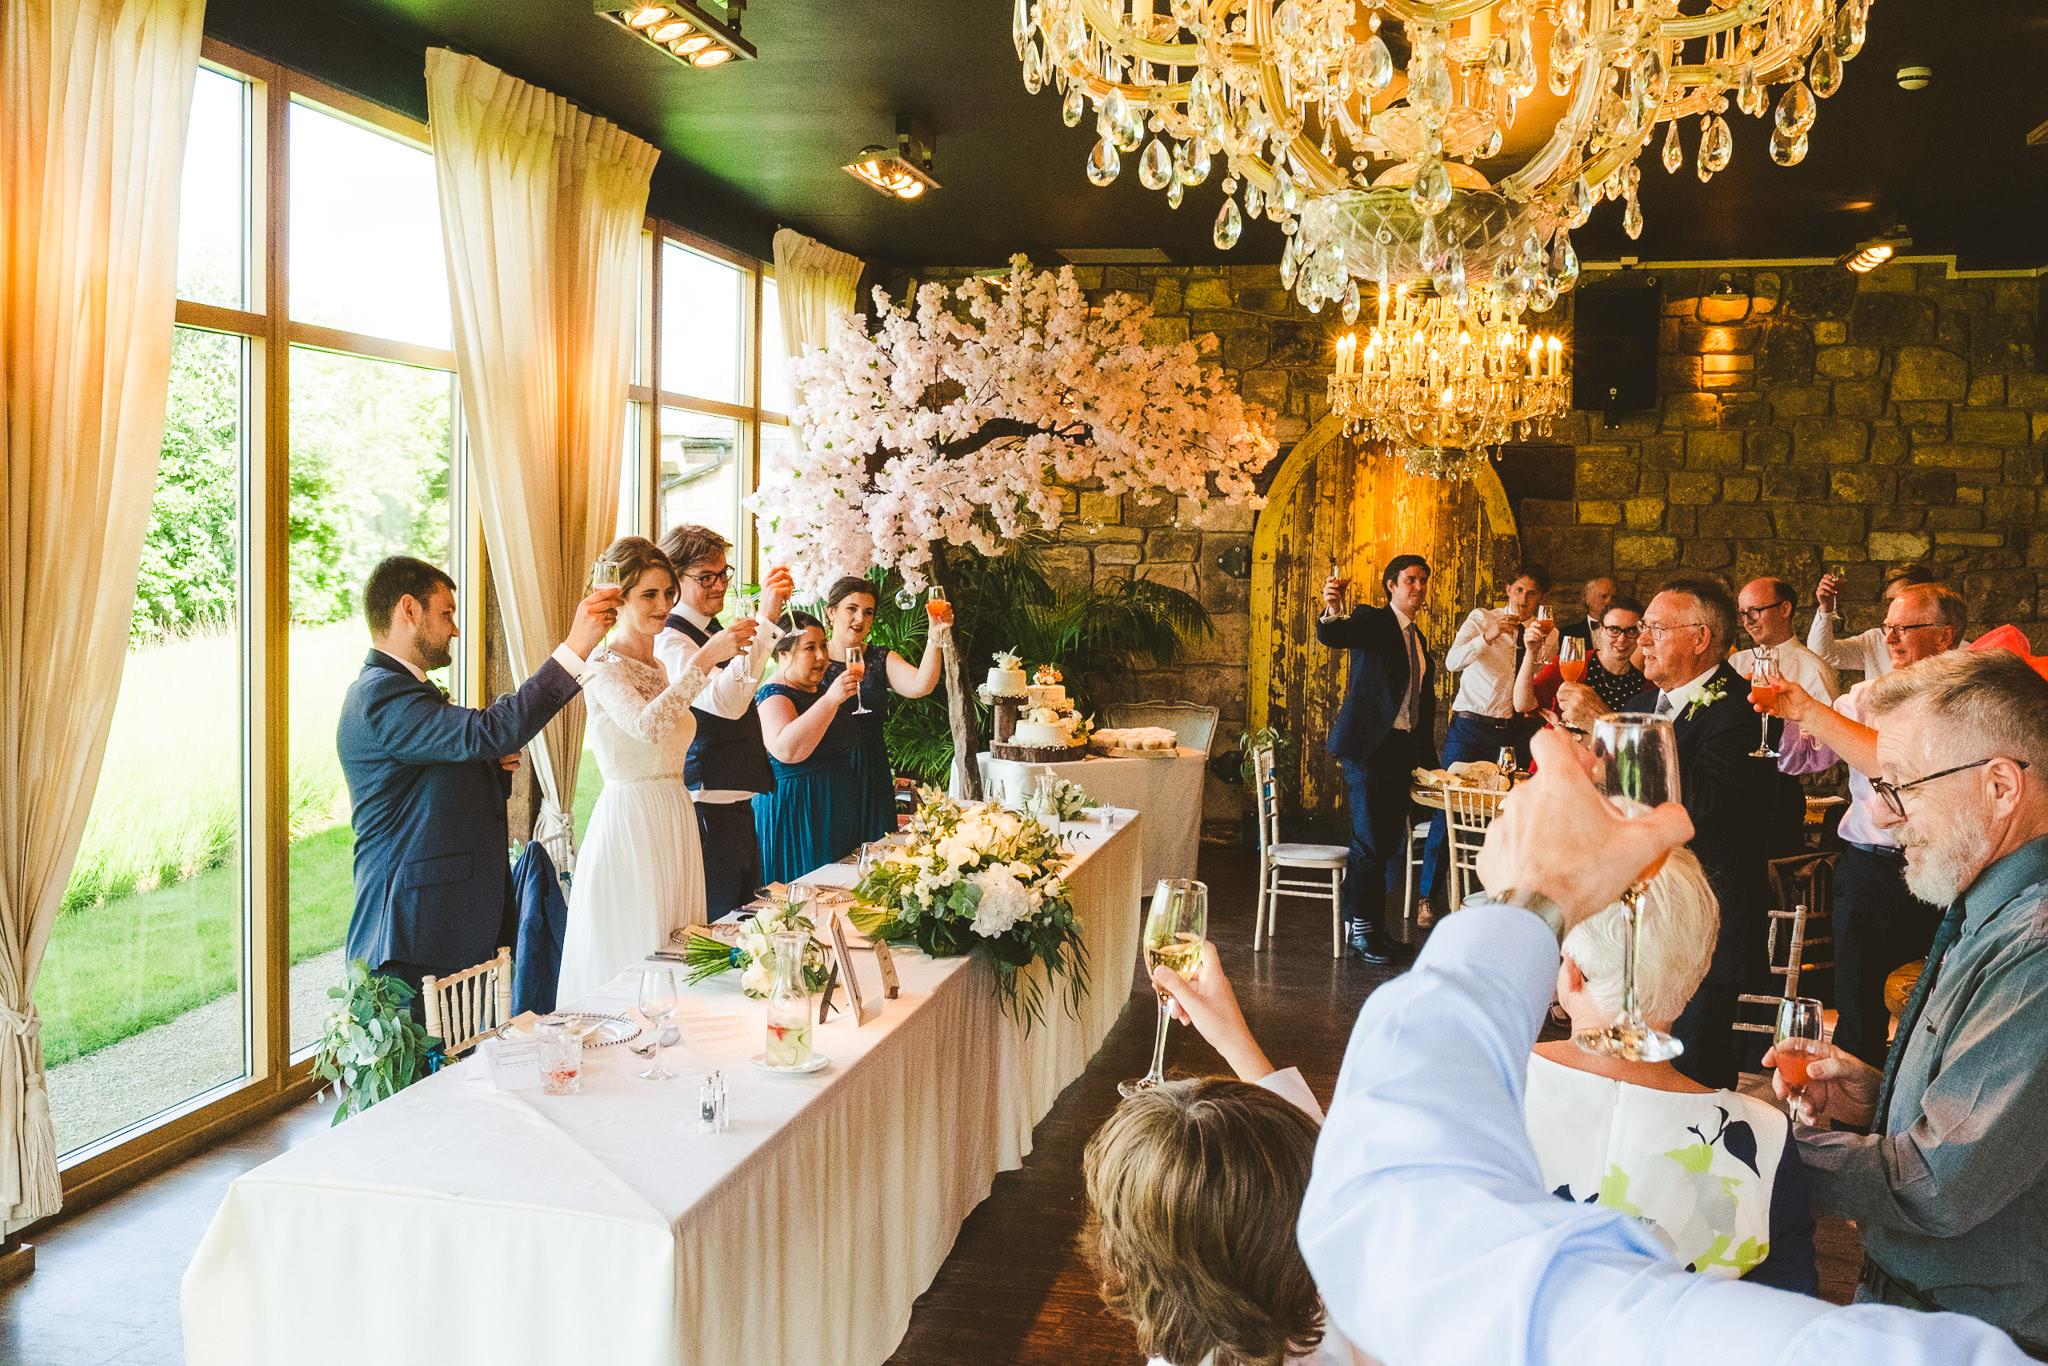 Toasting the wedding speeches